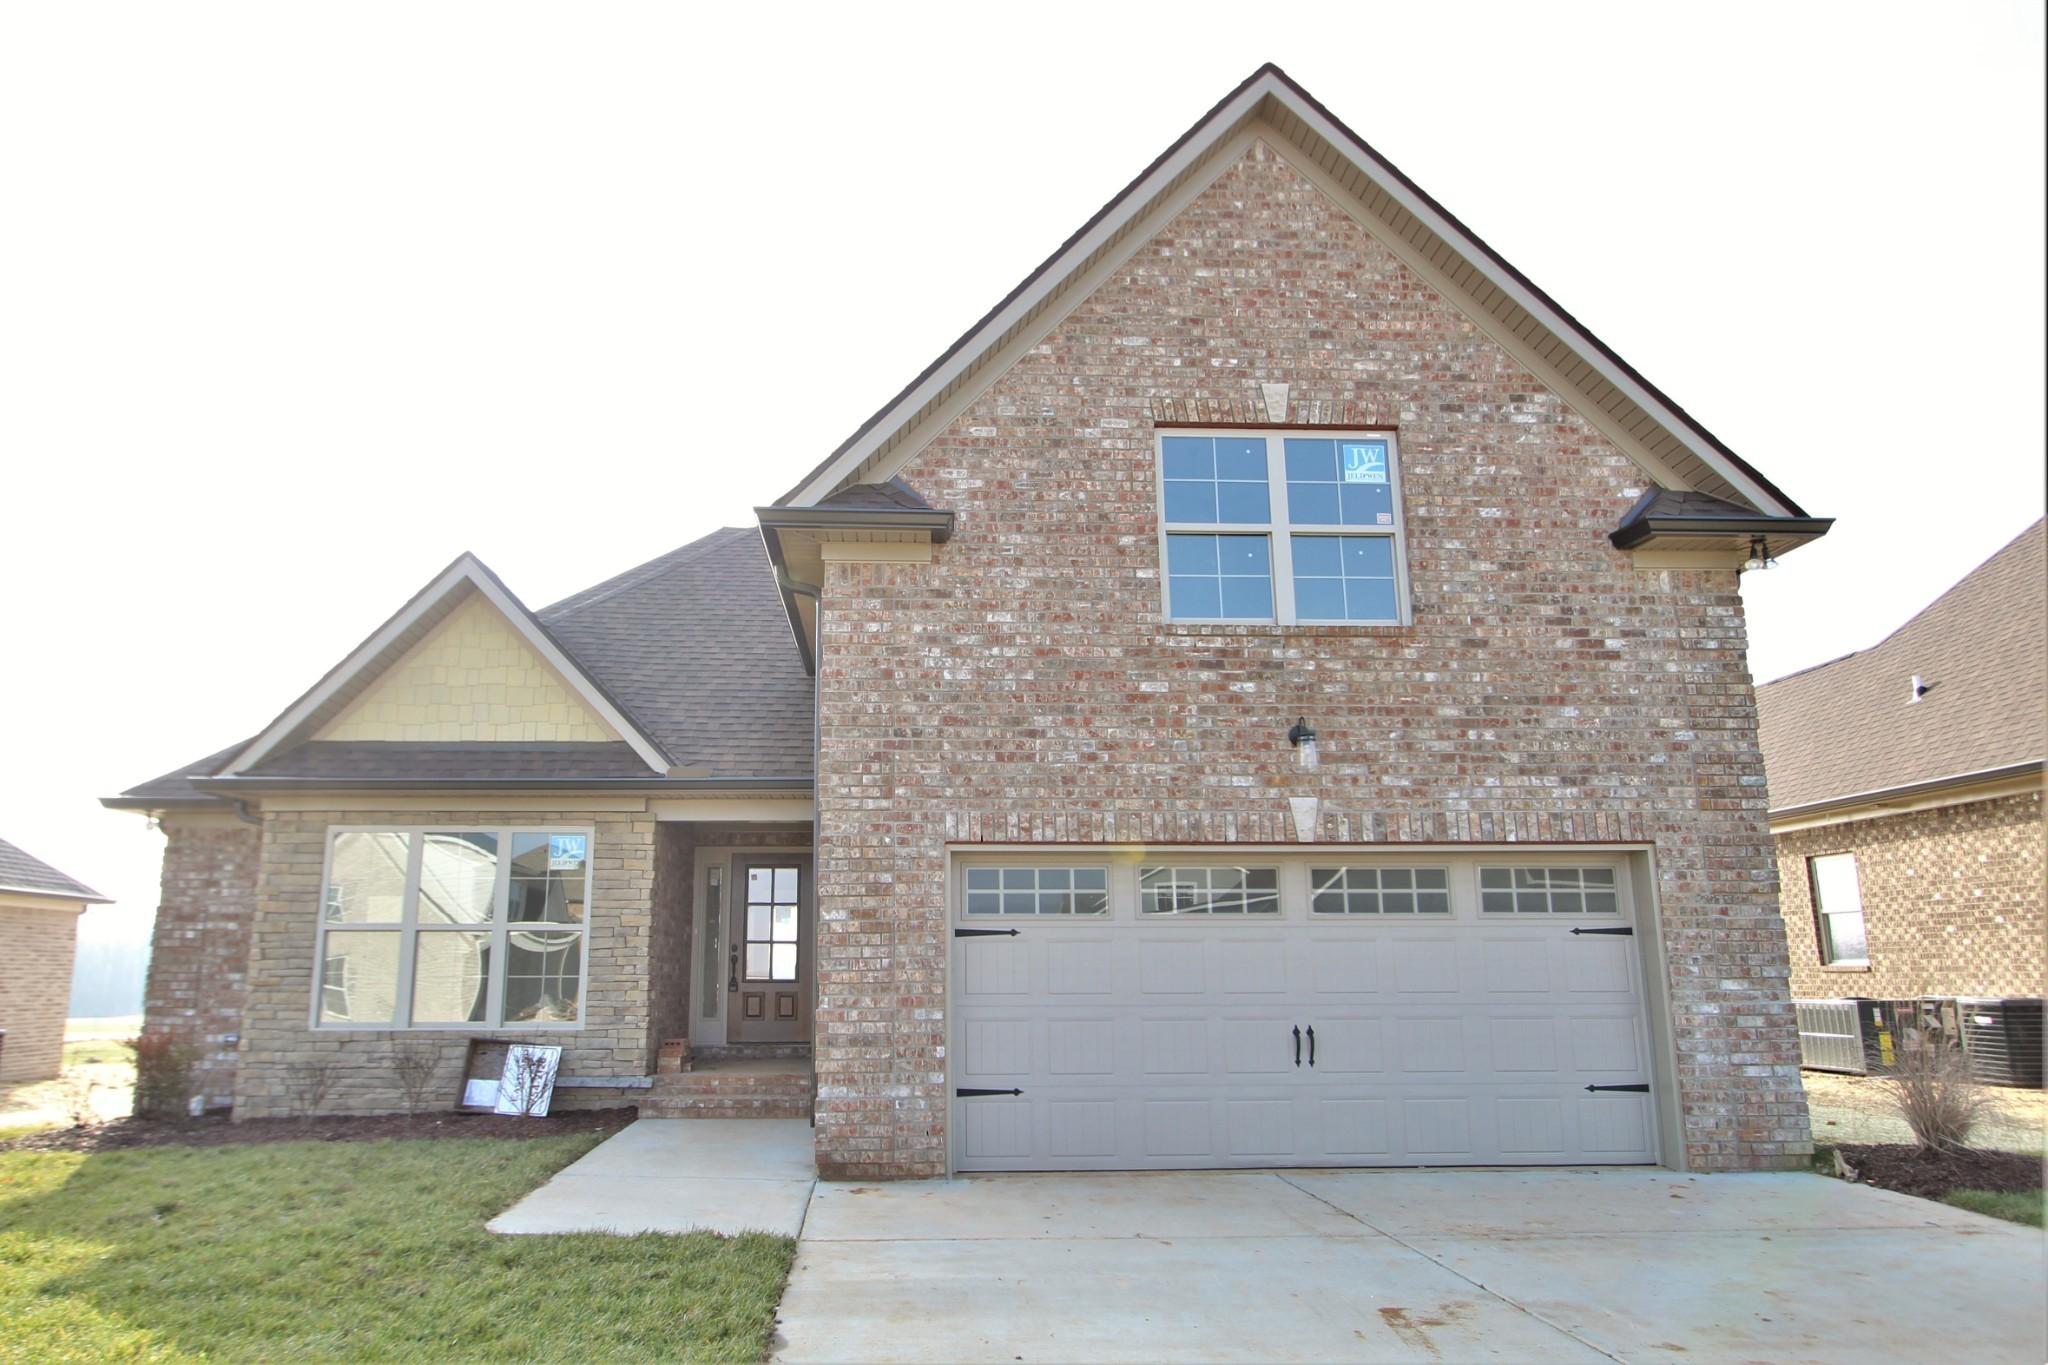 817 Ella Lane #36, Clarksville, TN 37043 - Clarksville, TN real estate listing